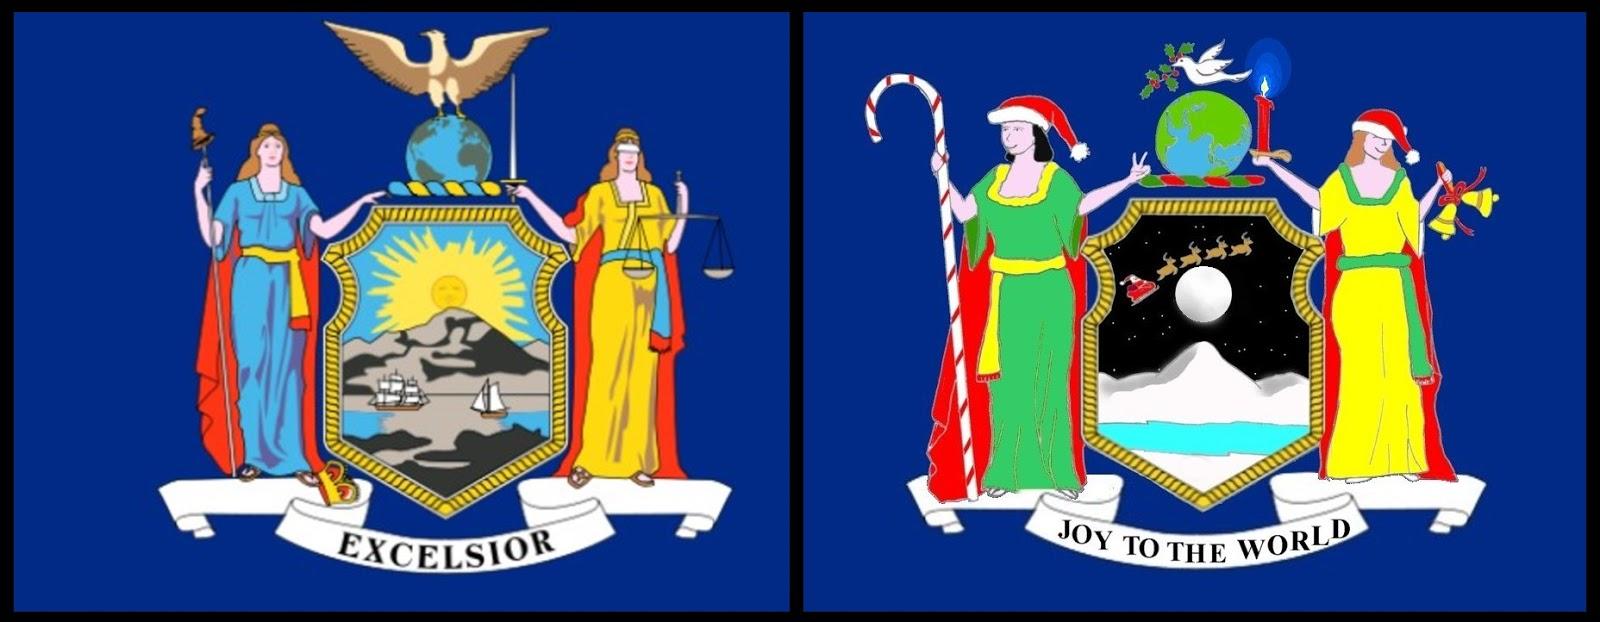 New york colony flag